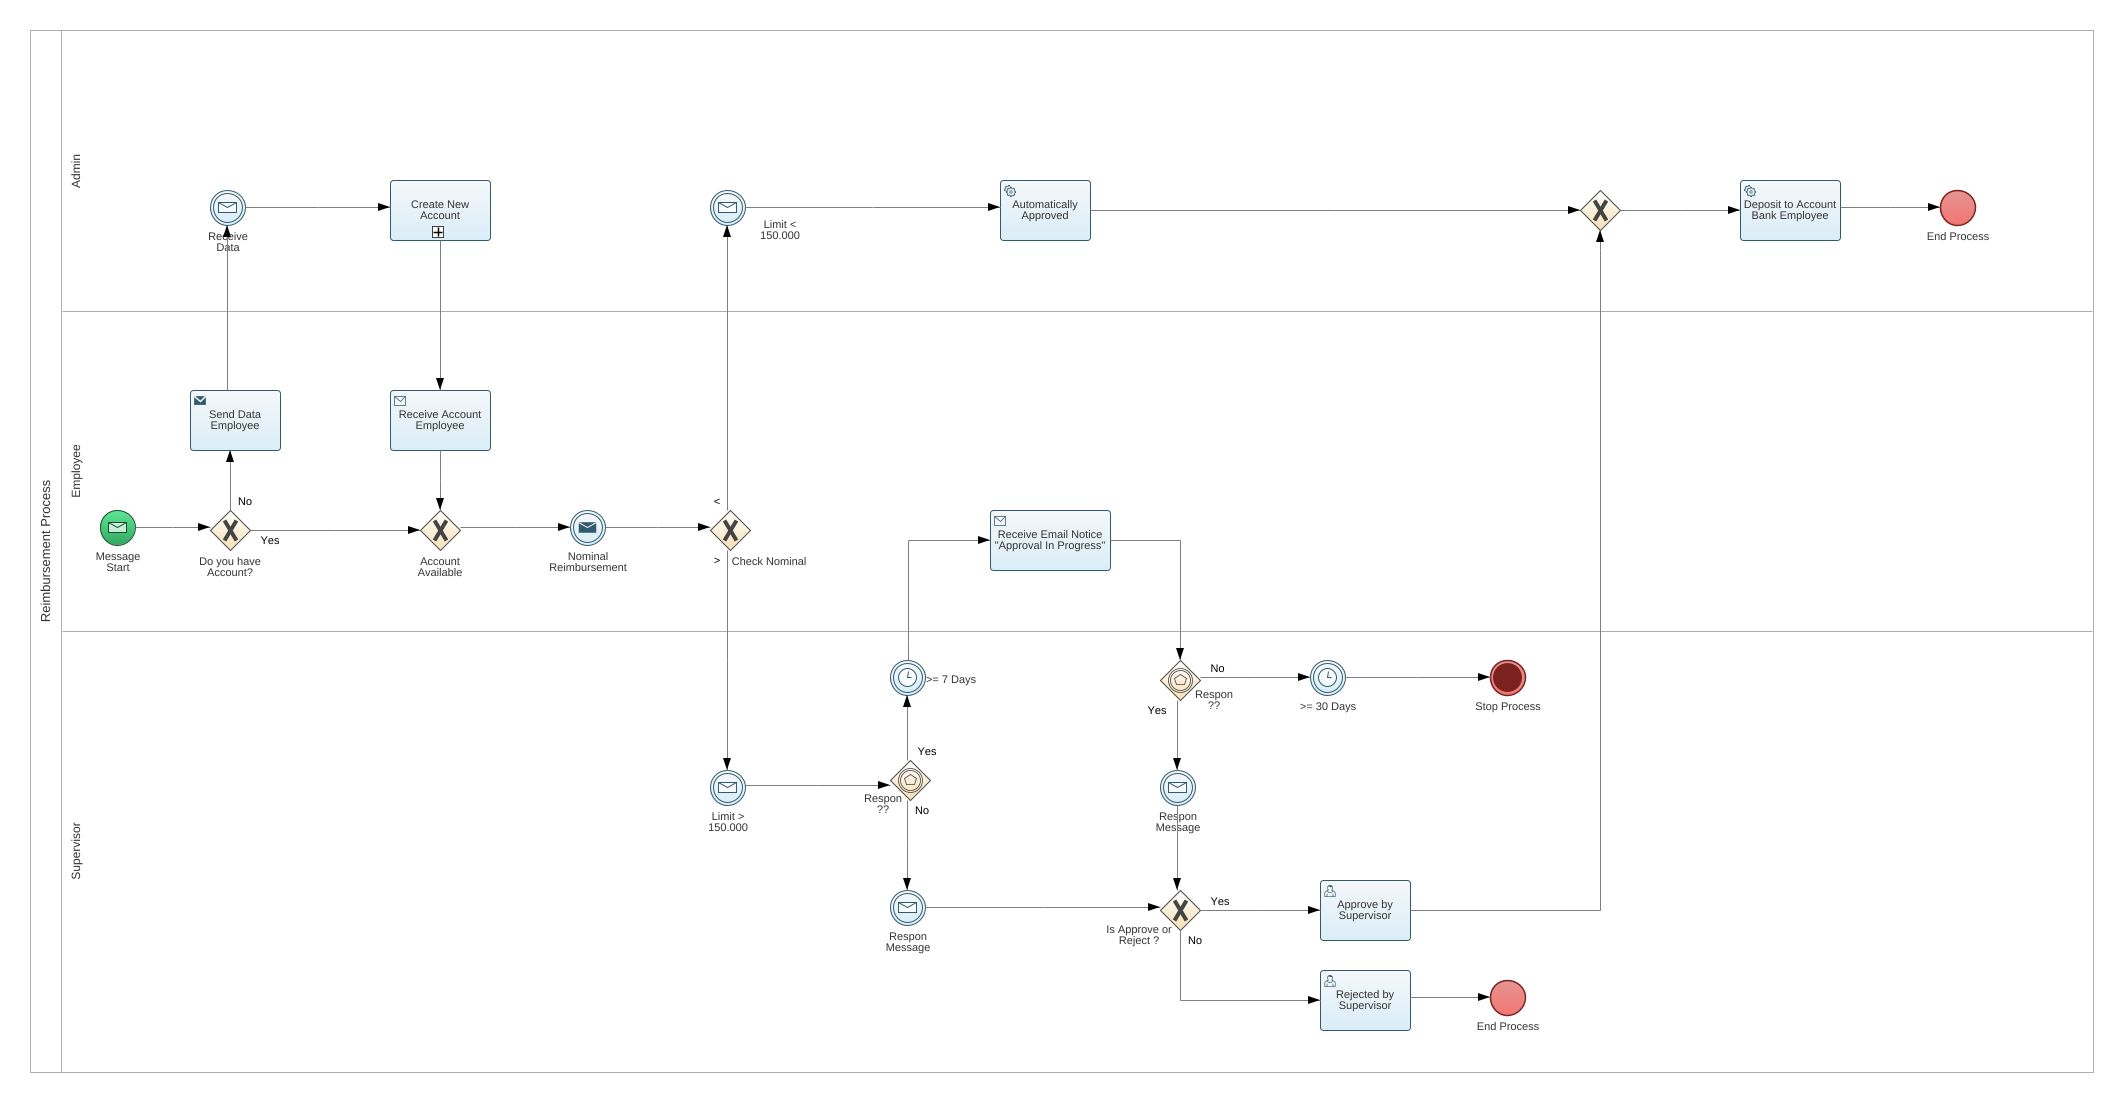 jpeg png svg collaboration diagram - Bpmn Collaboration Diagram